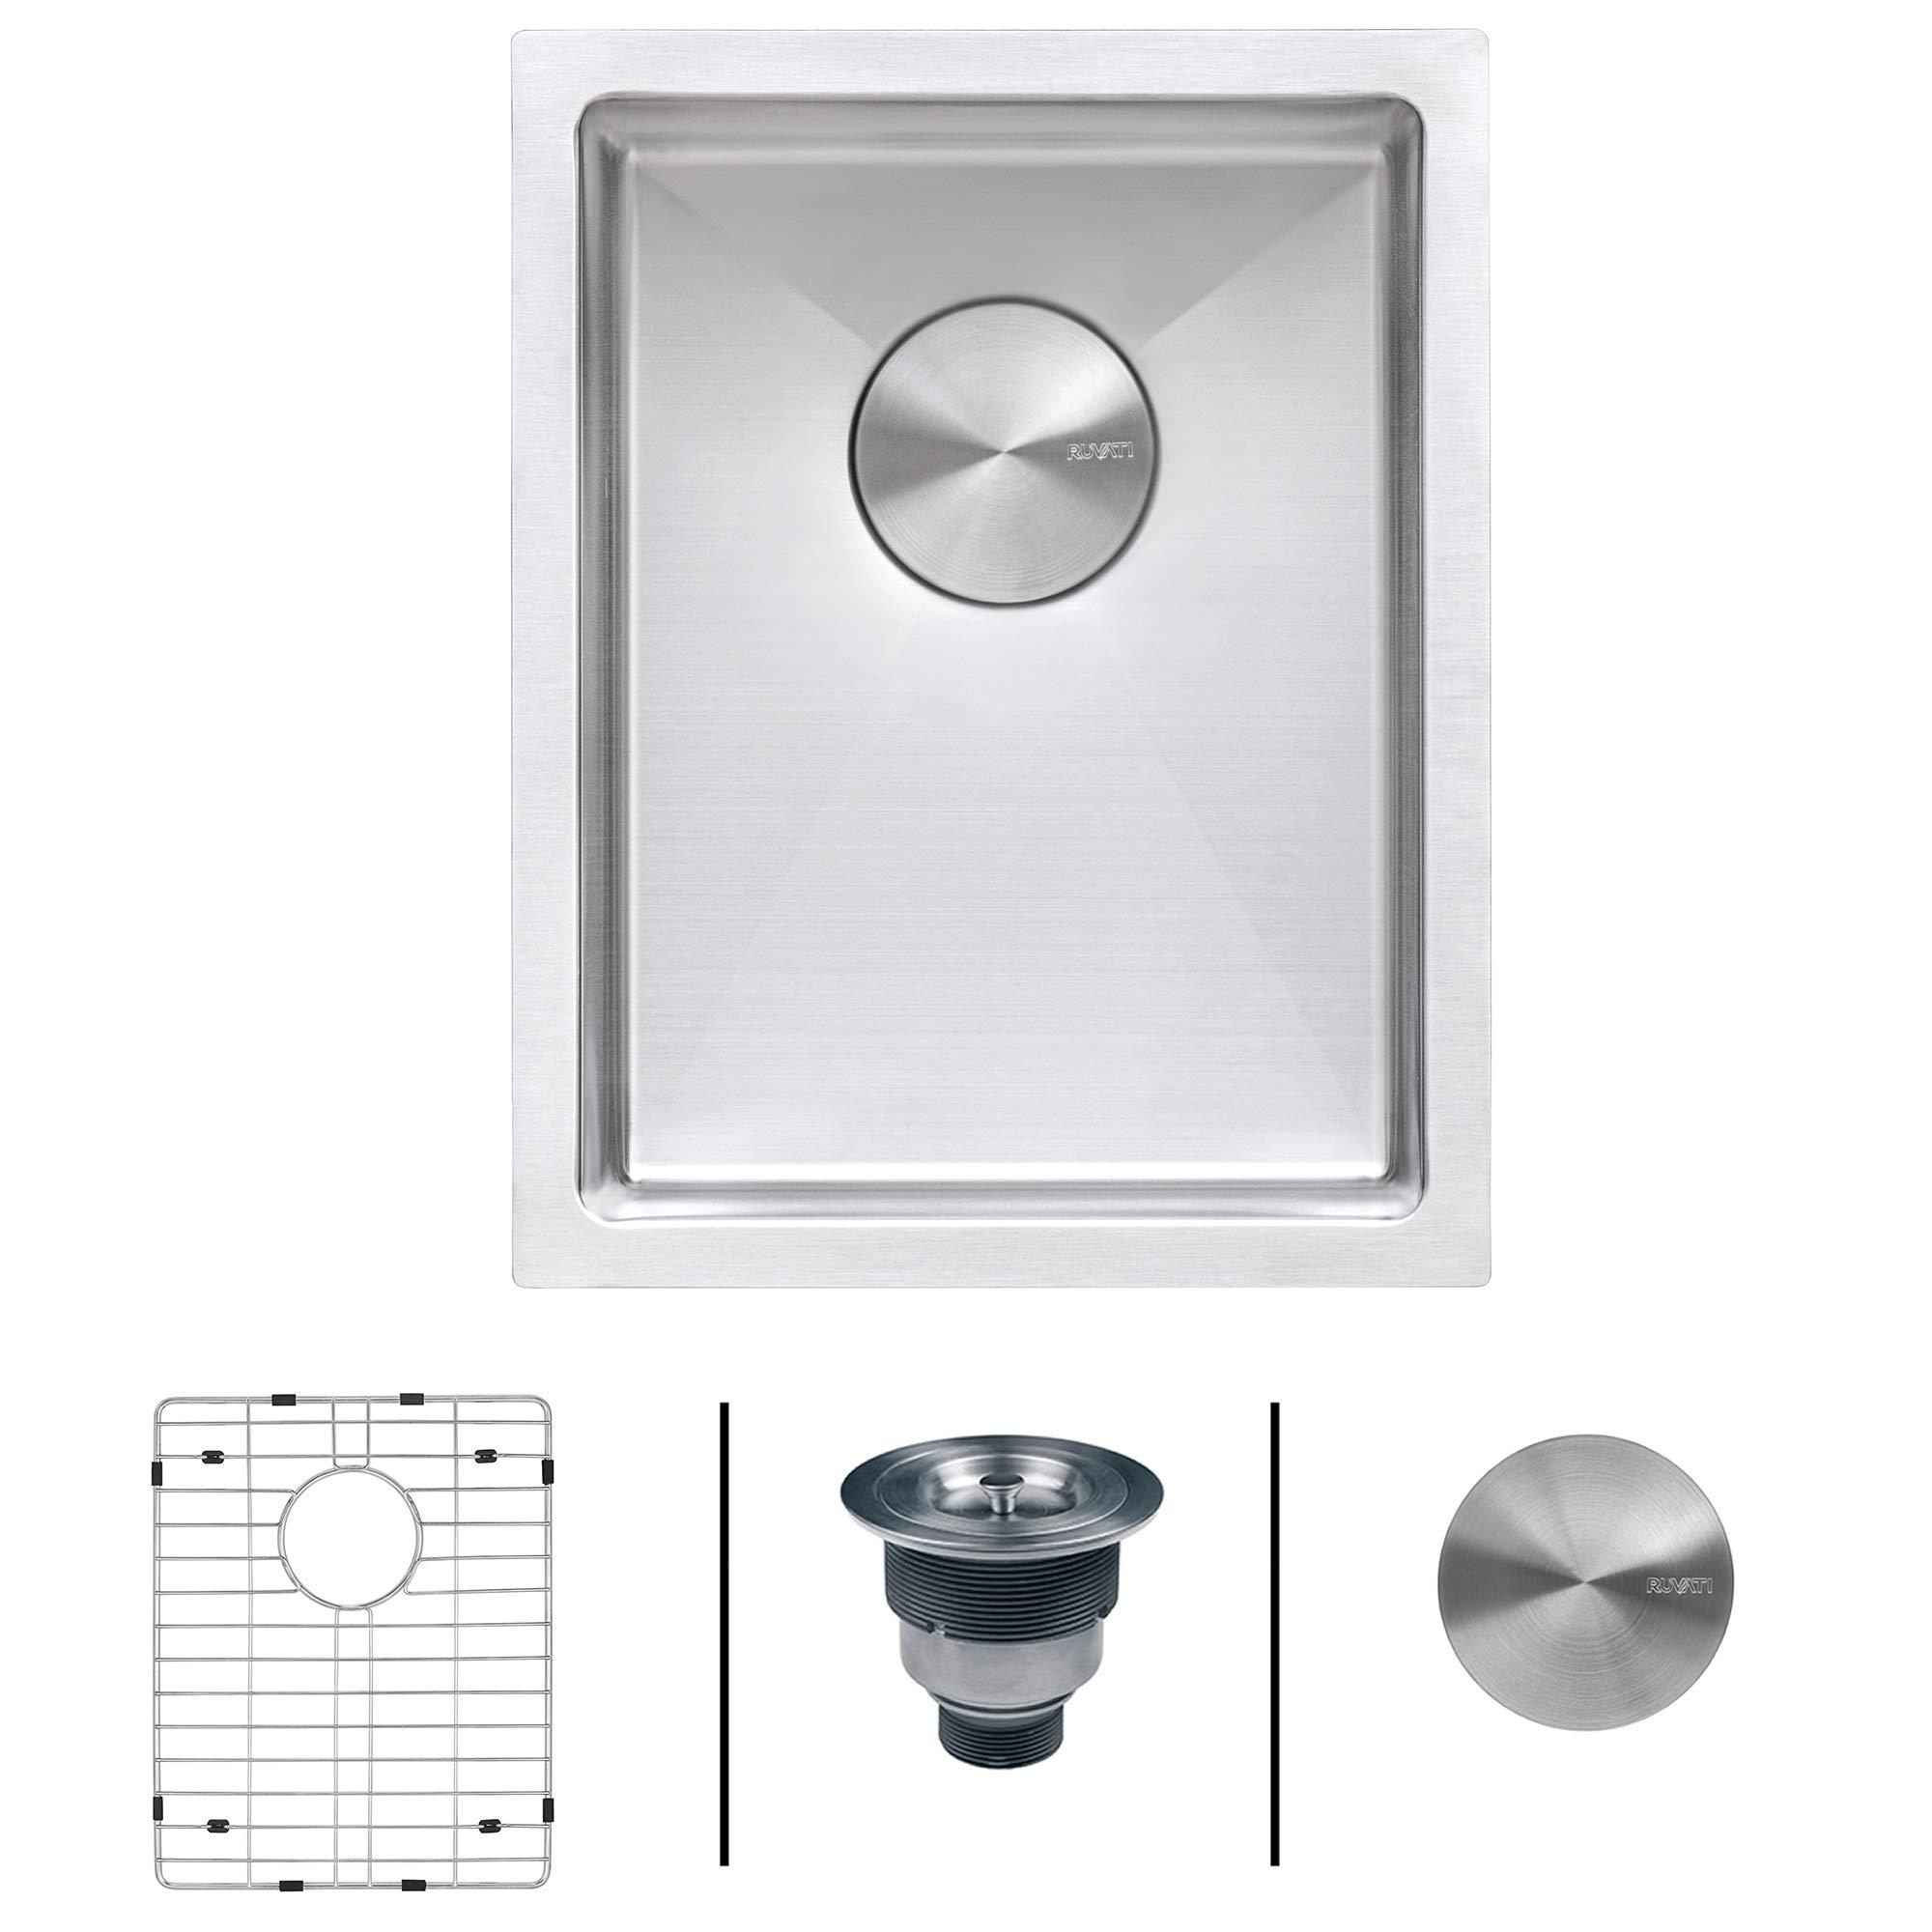 Ruvati 14-inch Undermount Wet Bar Prep Sink Tight Radius 16 Gauge Stainless Steel Single Bowl - RVH7114 by Ruvati